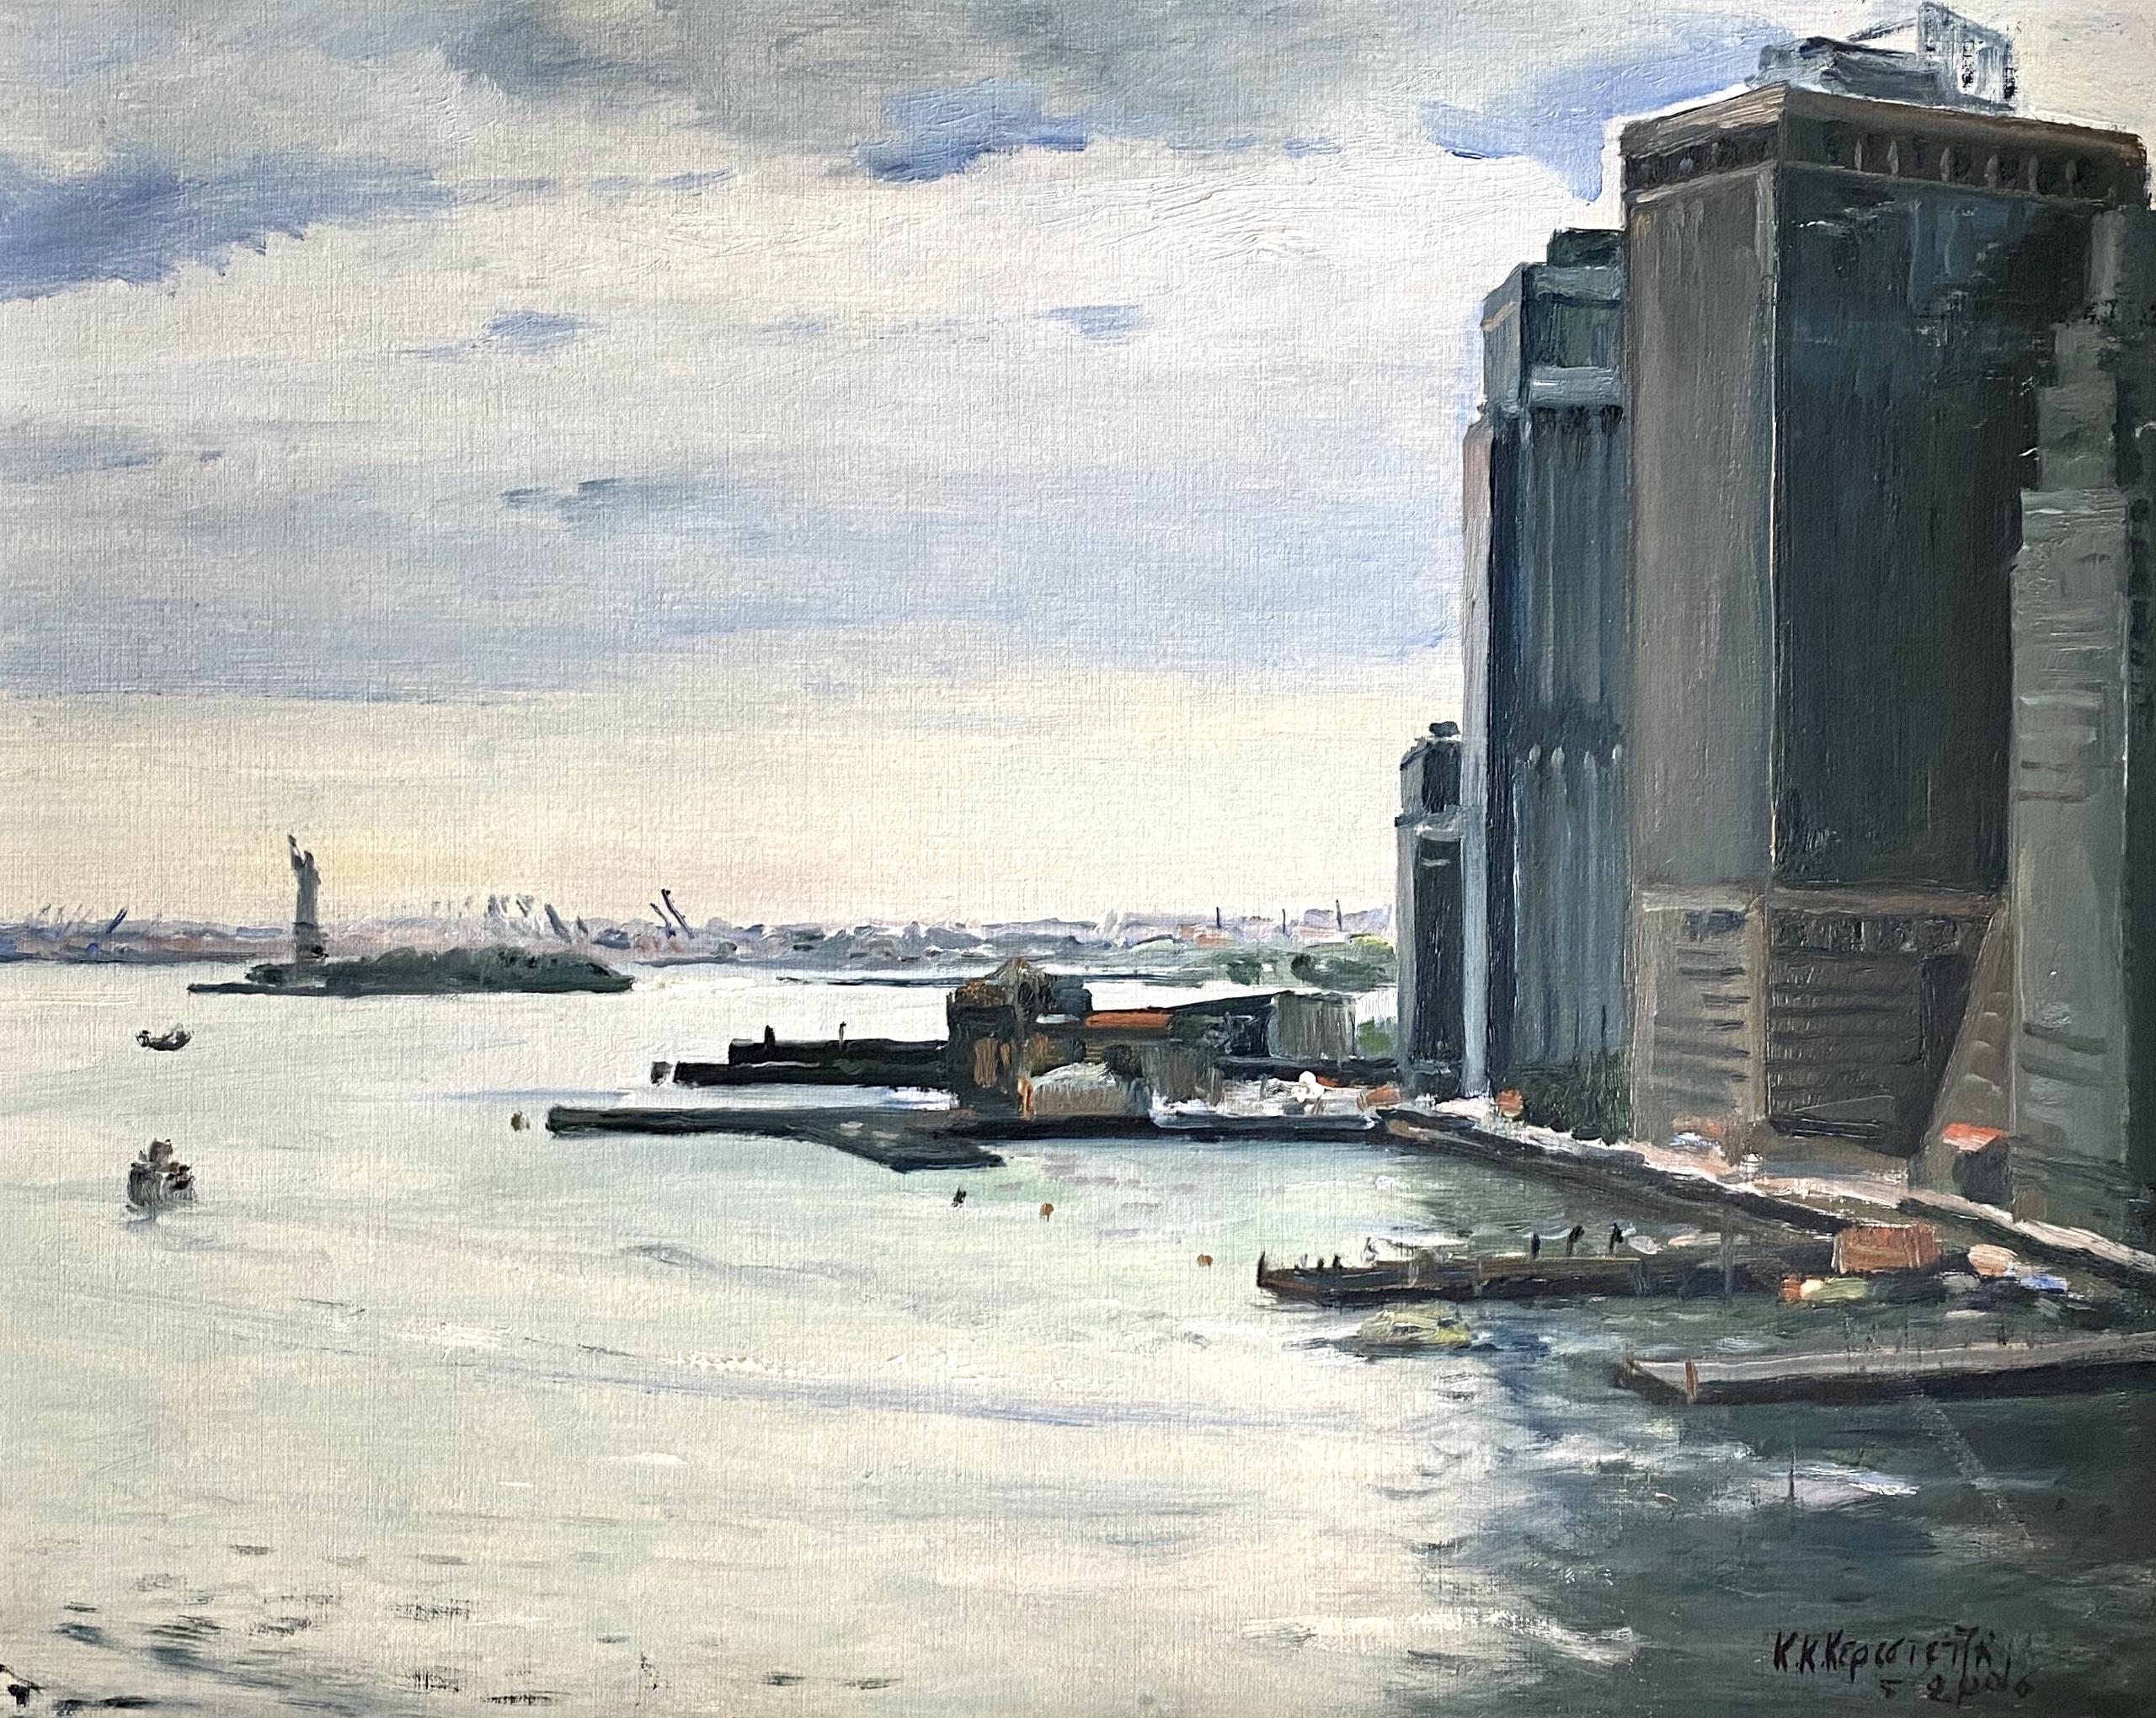 Constantinos Kerestetzis (Greek), New York, 2006, oil on cardboard, 40 x 50 cm